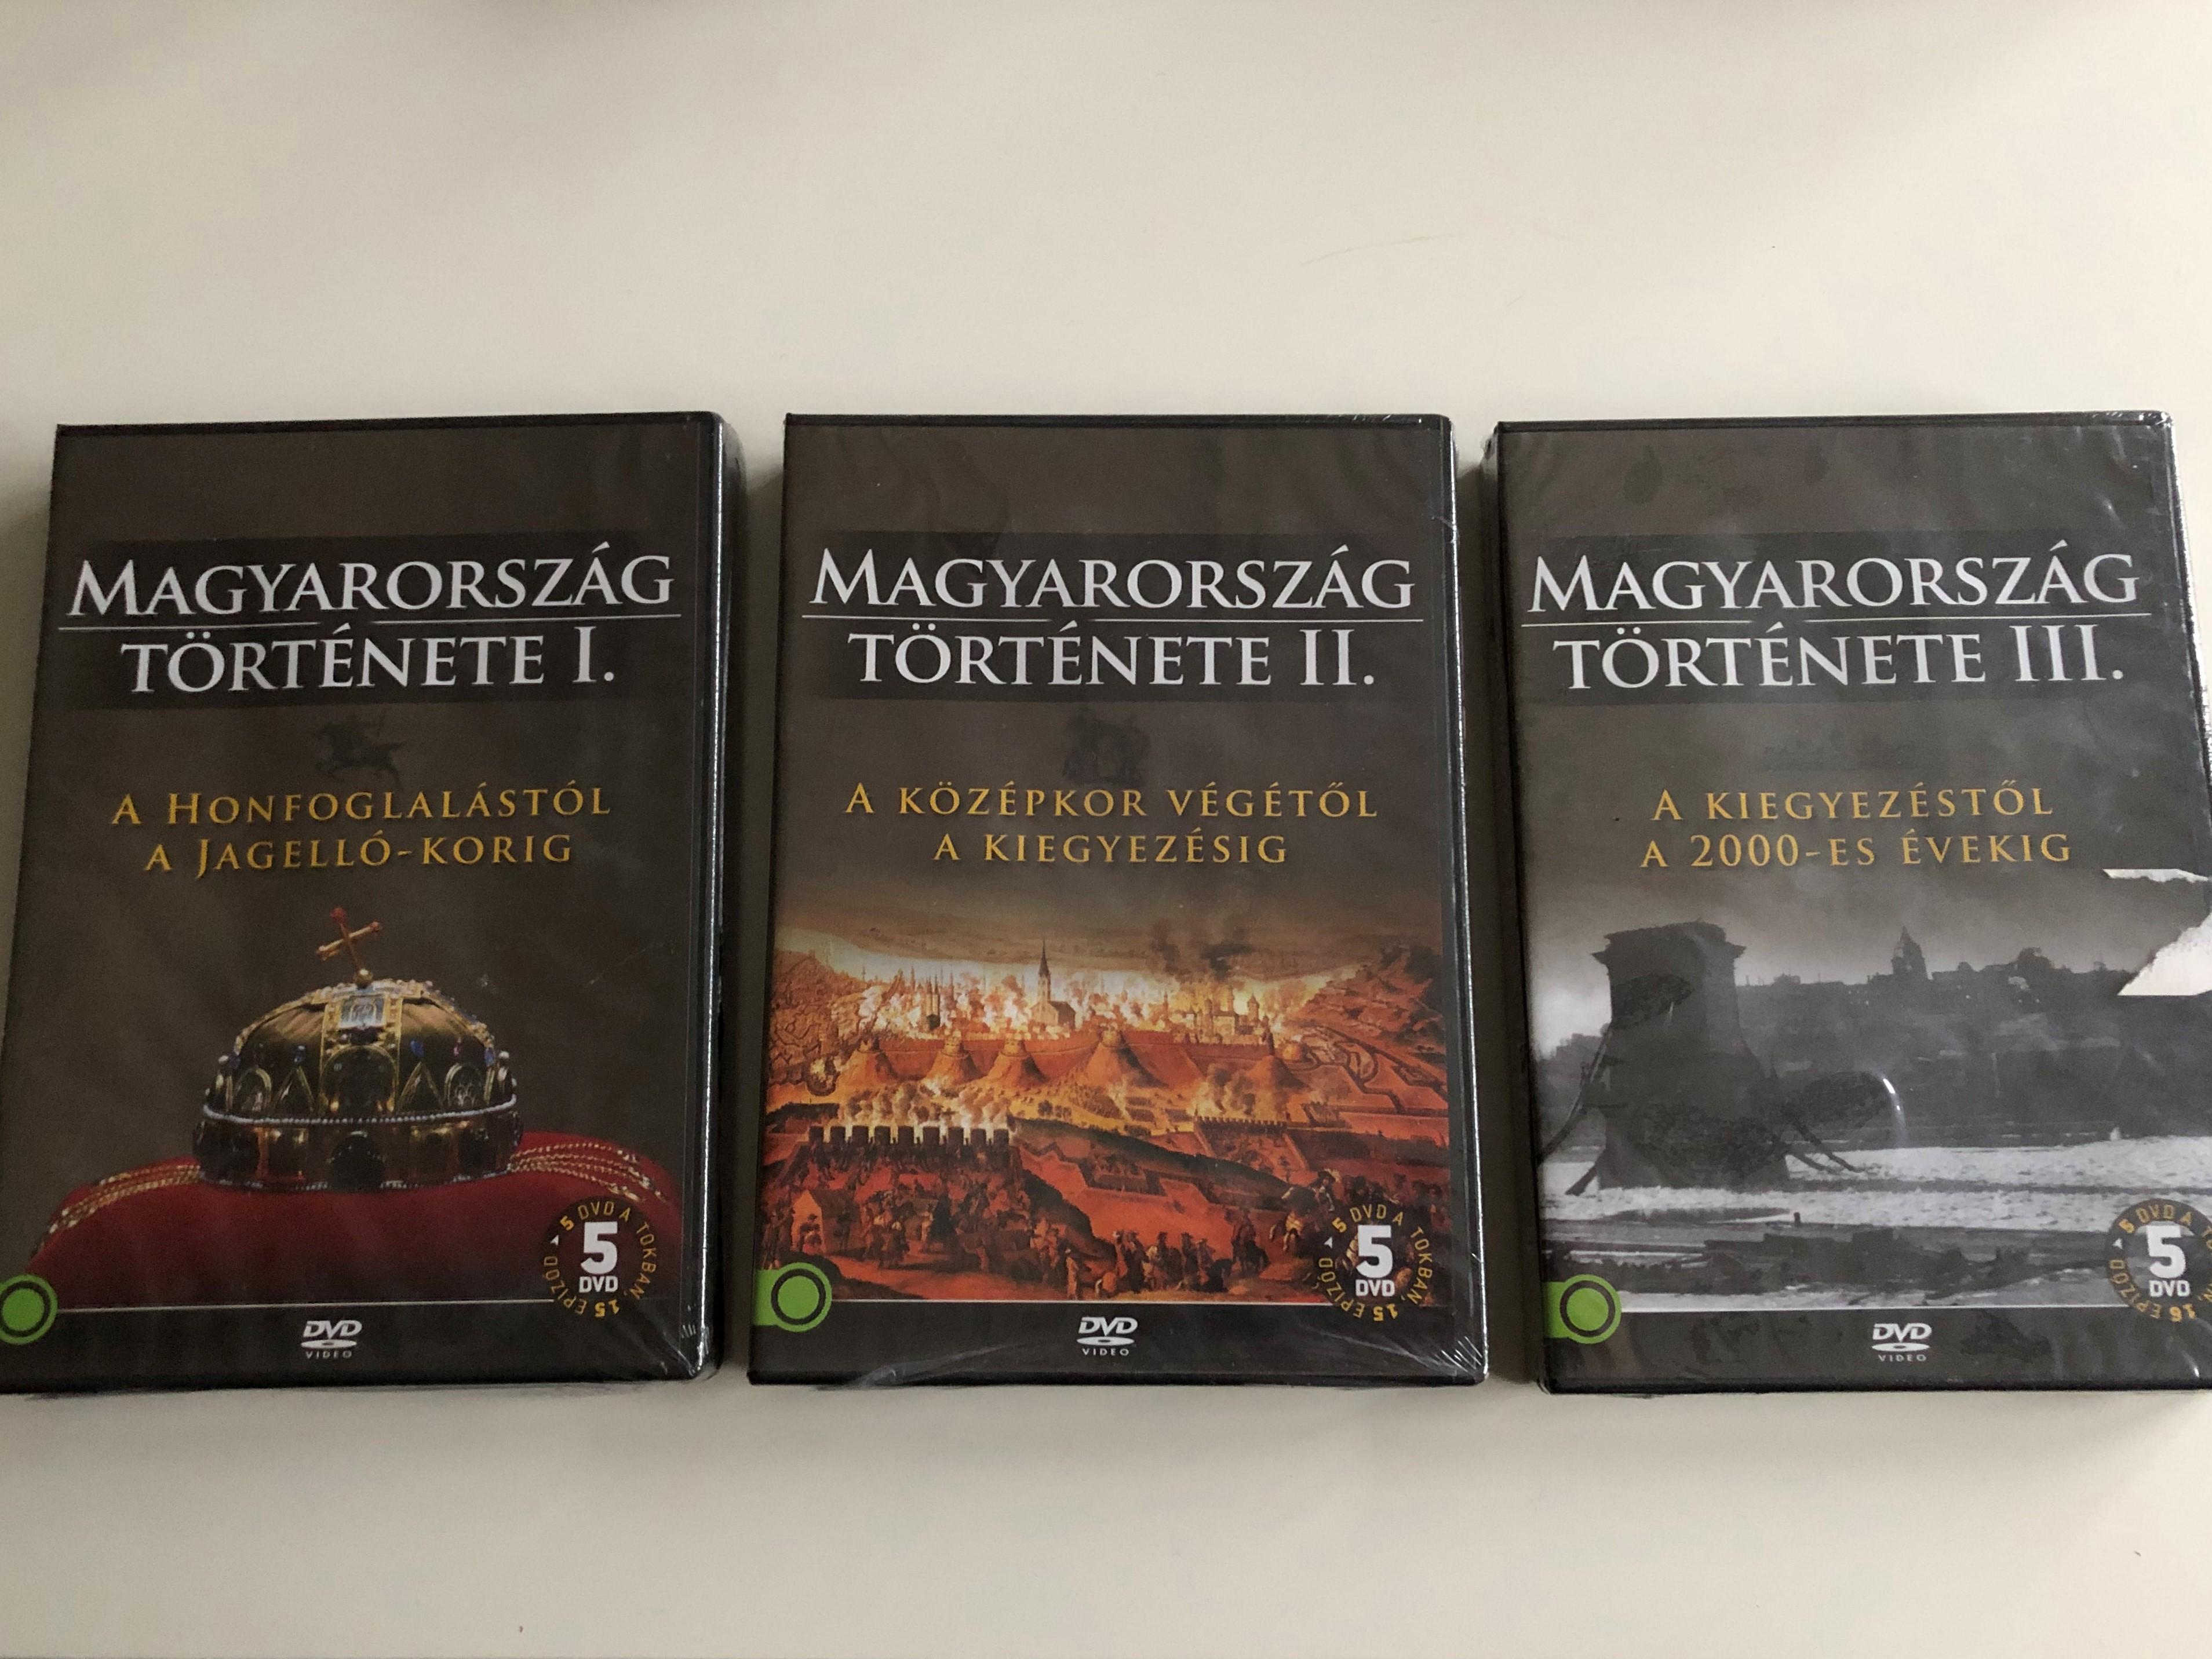 magyarorsz-g-t-rt-nete-i-iii-dvd-full-set-1.jpg